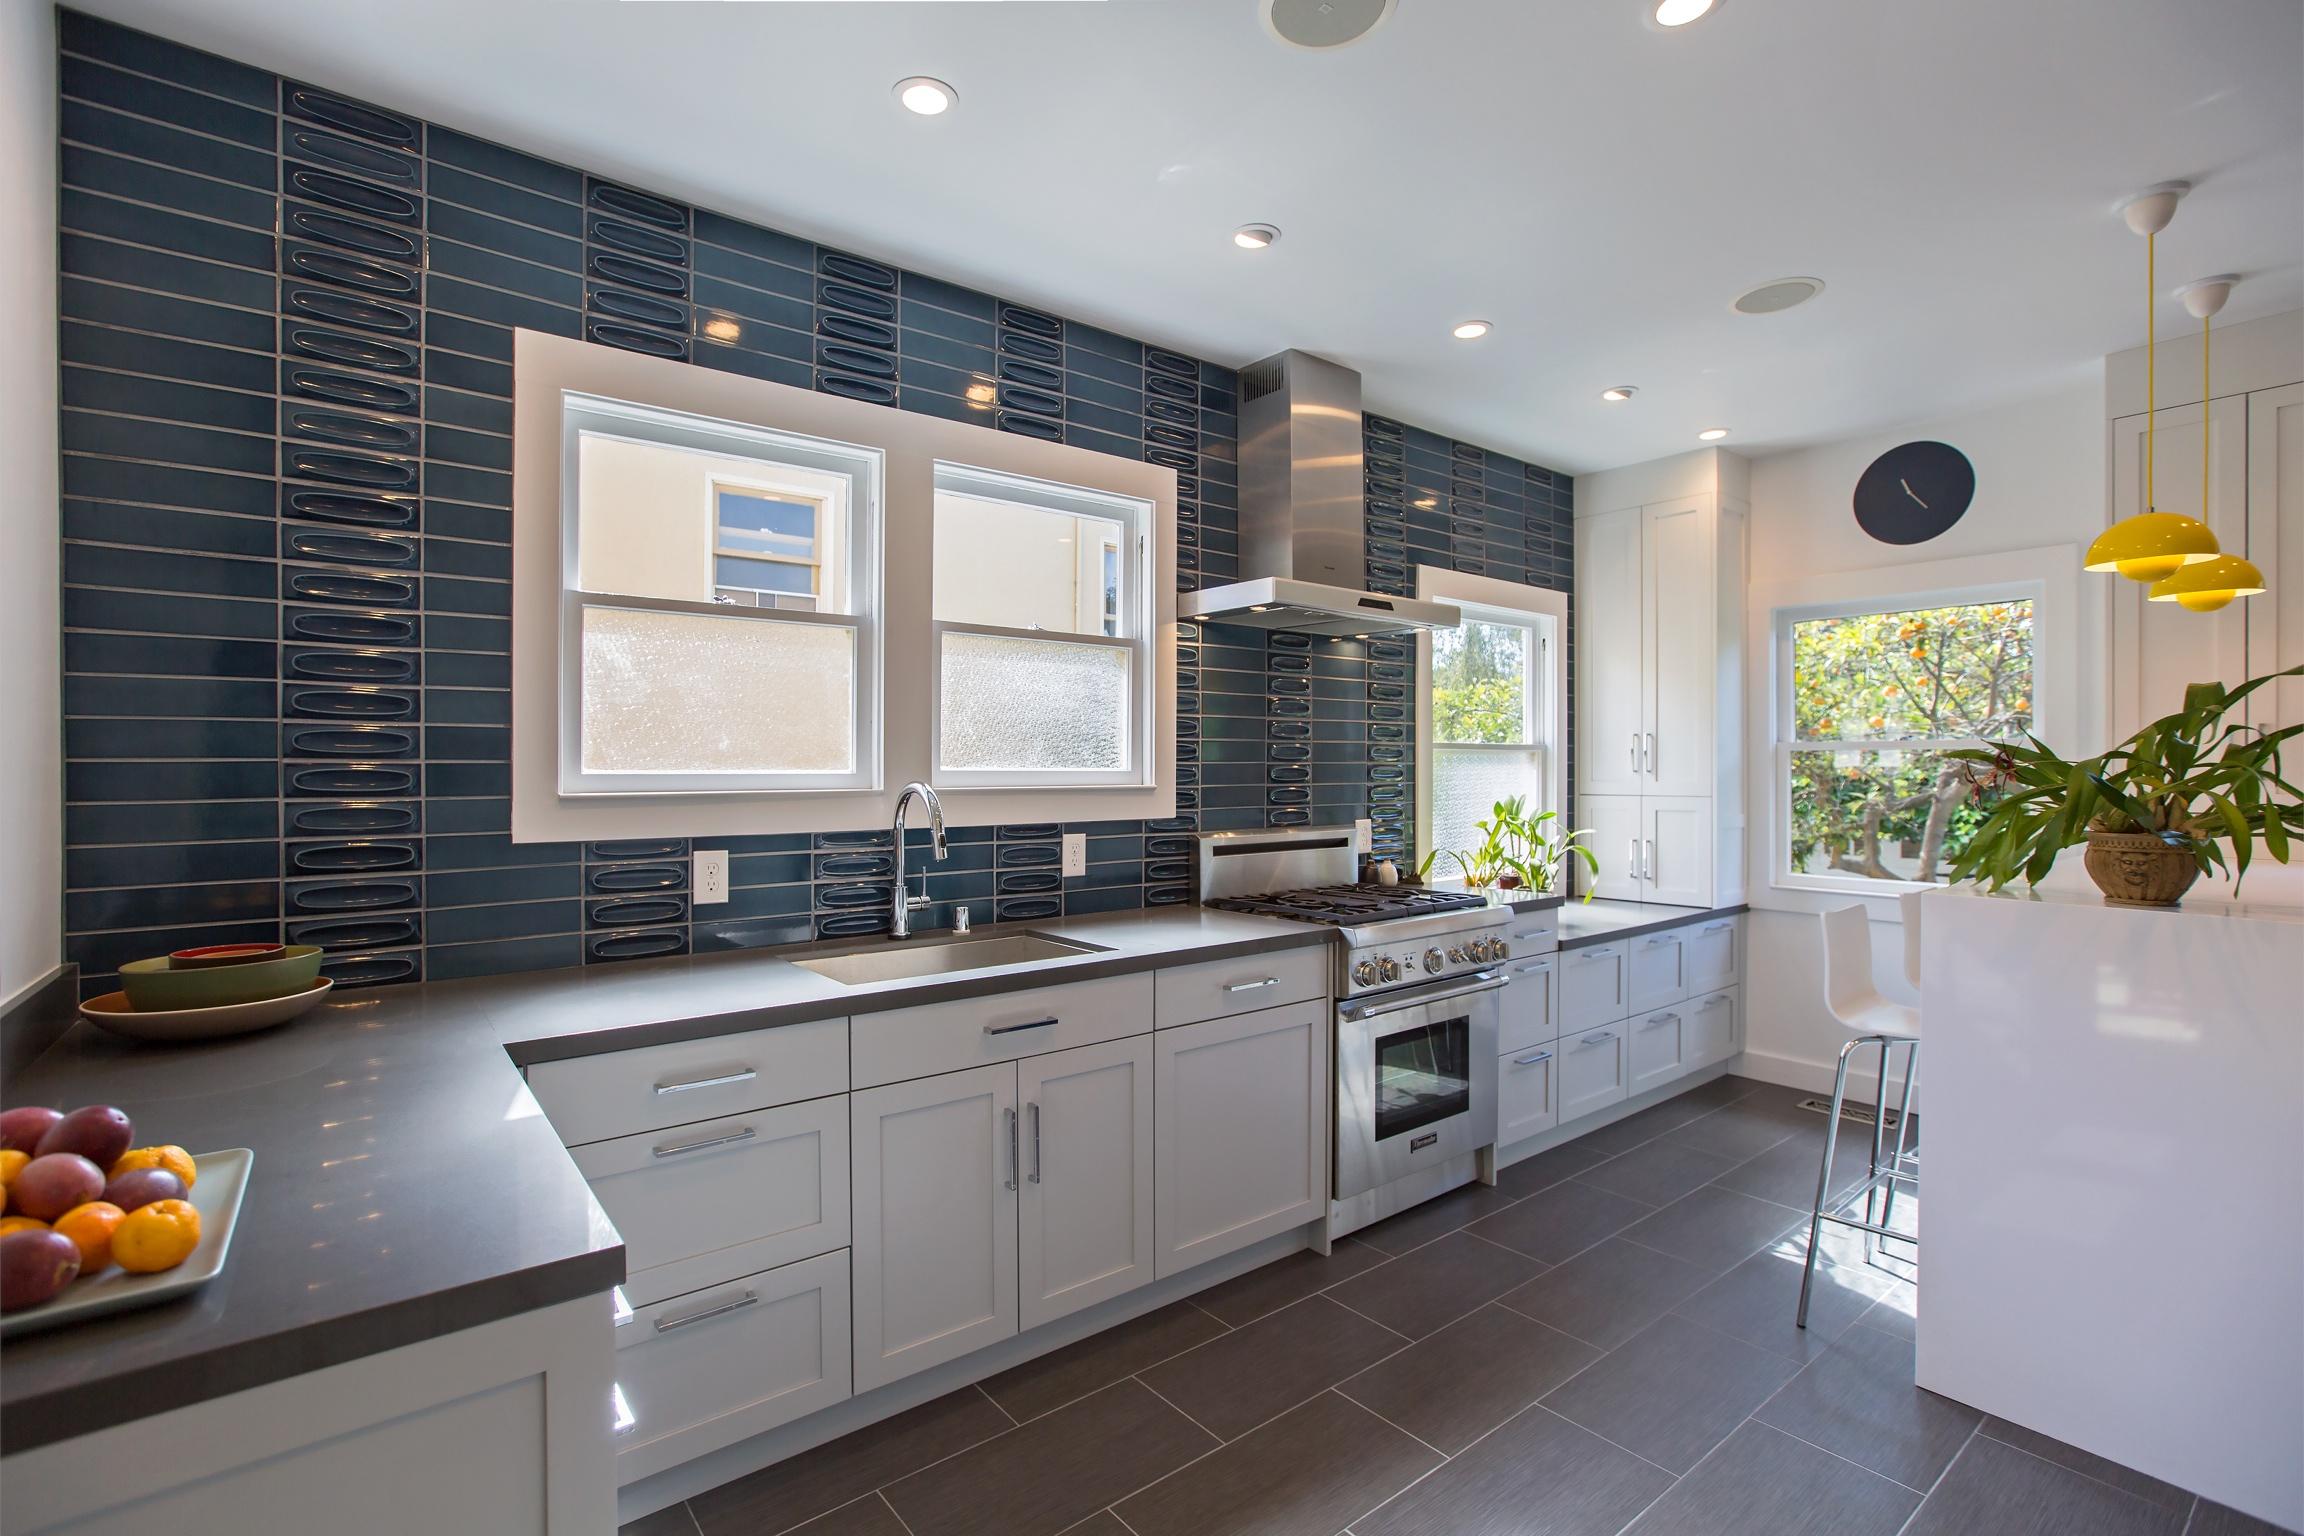 william-adams-design-christmas-tree-lane-2-kitchen-white-cabinets-grey-floors-blue-tile-backsplash.jpg